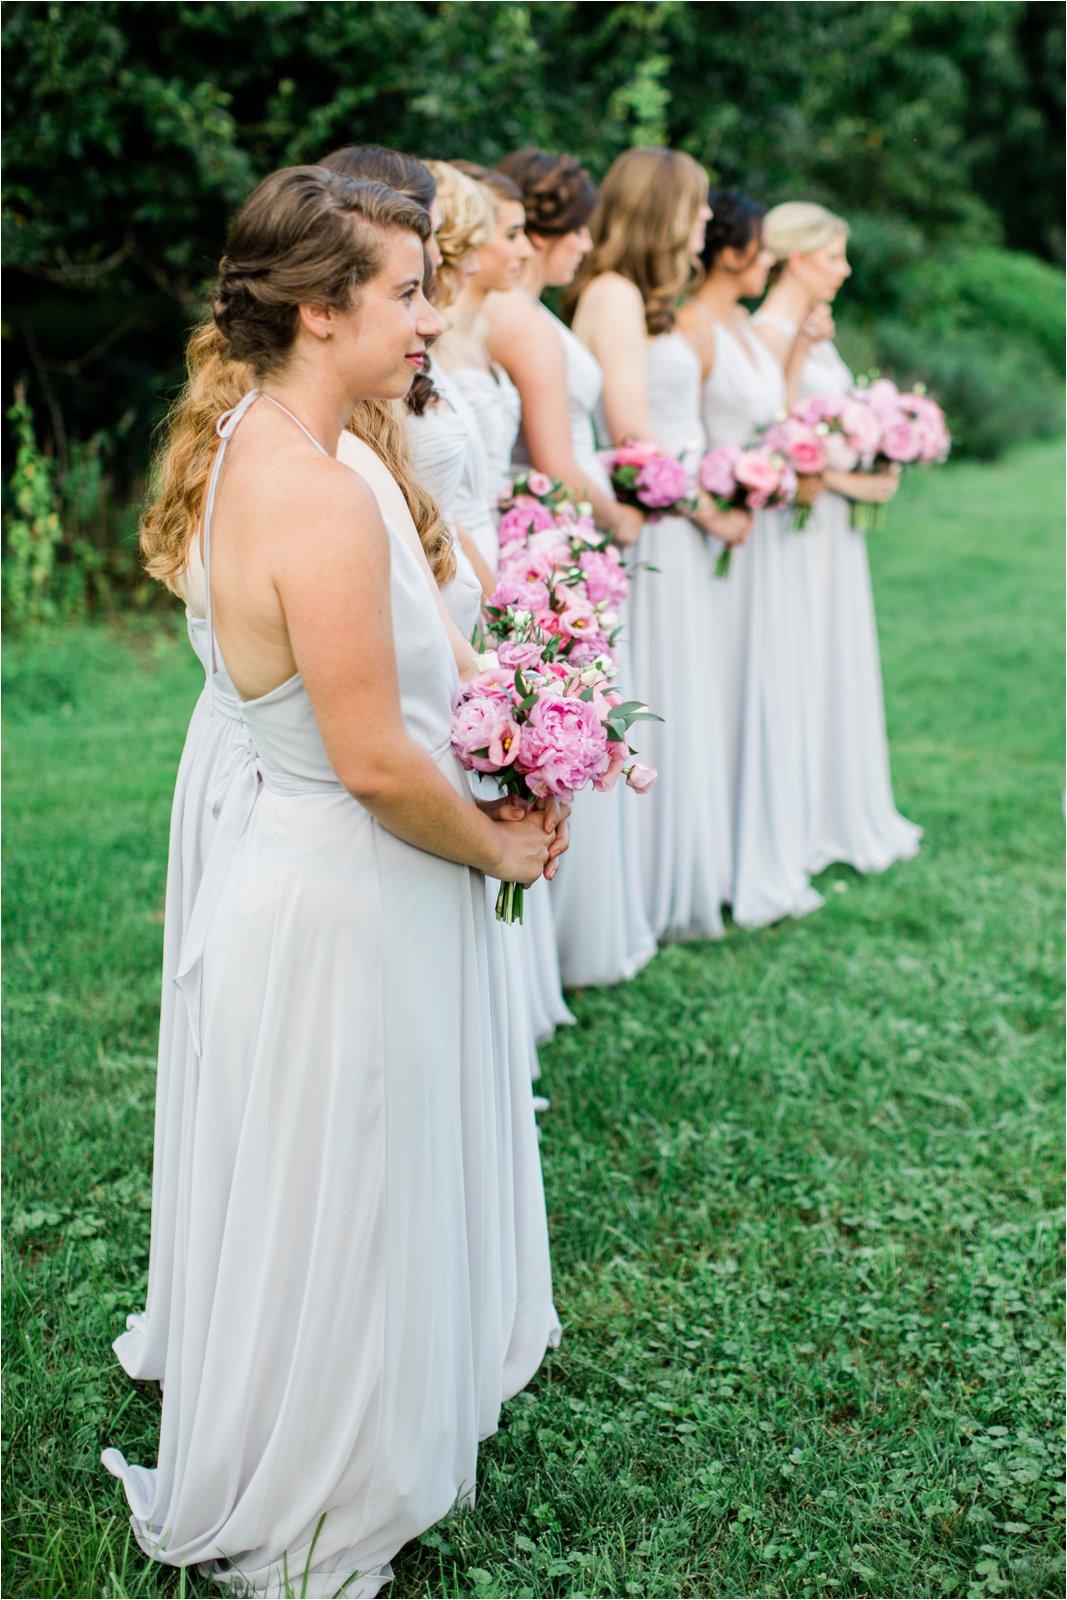 Baltimore Wedding Photographer_084.jpg